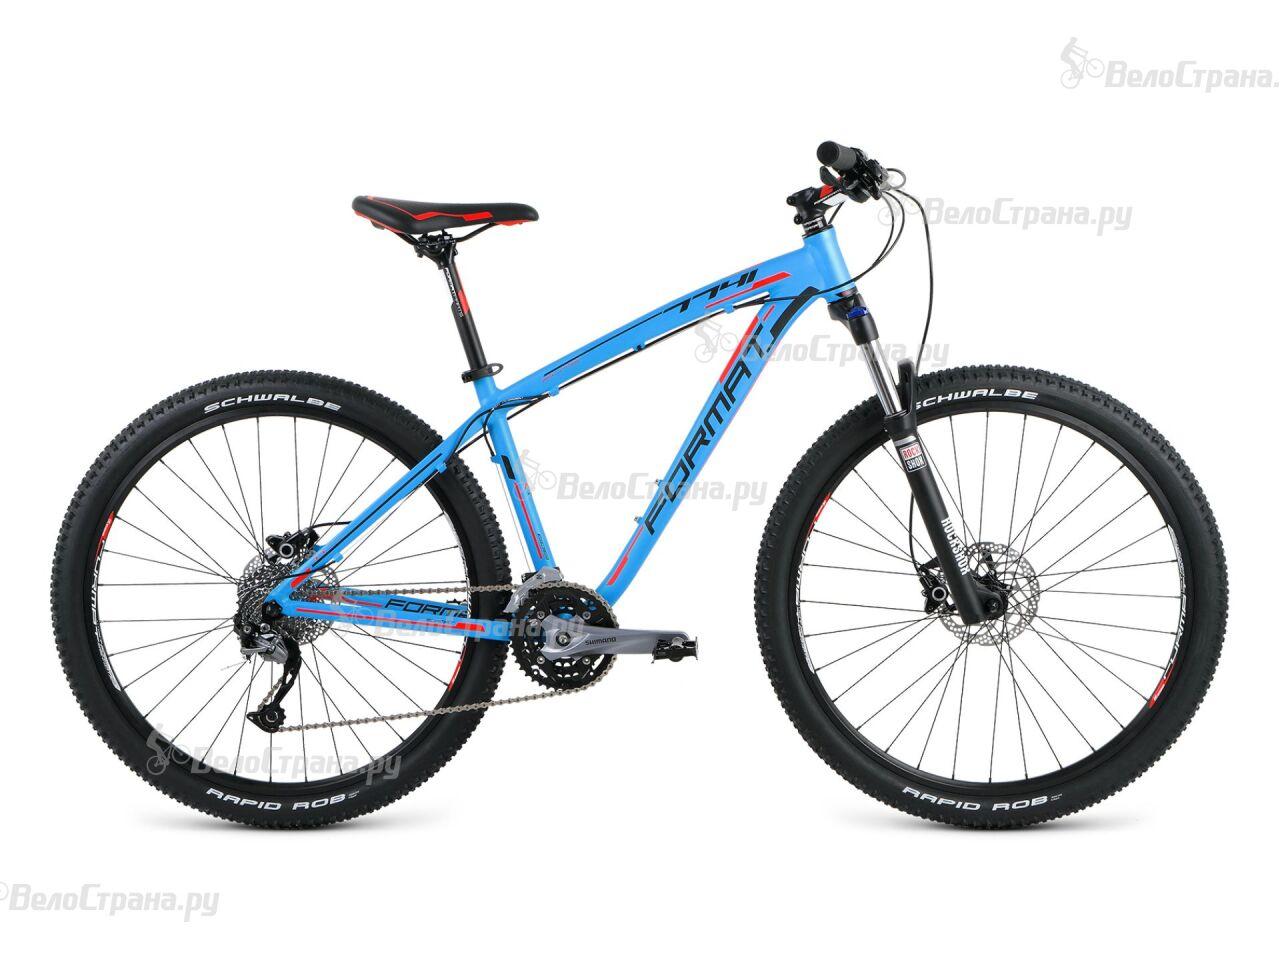 цена на Велосипед Format 7741 Elite (2016)